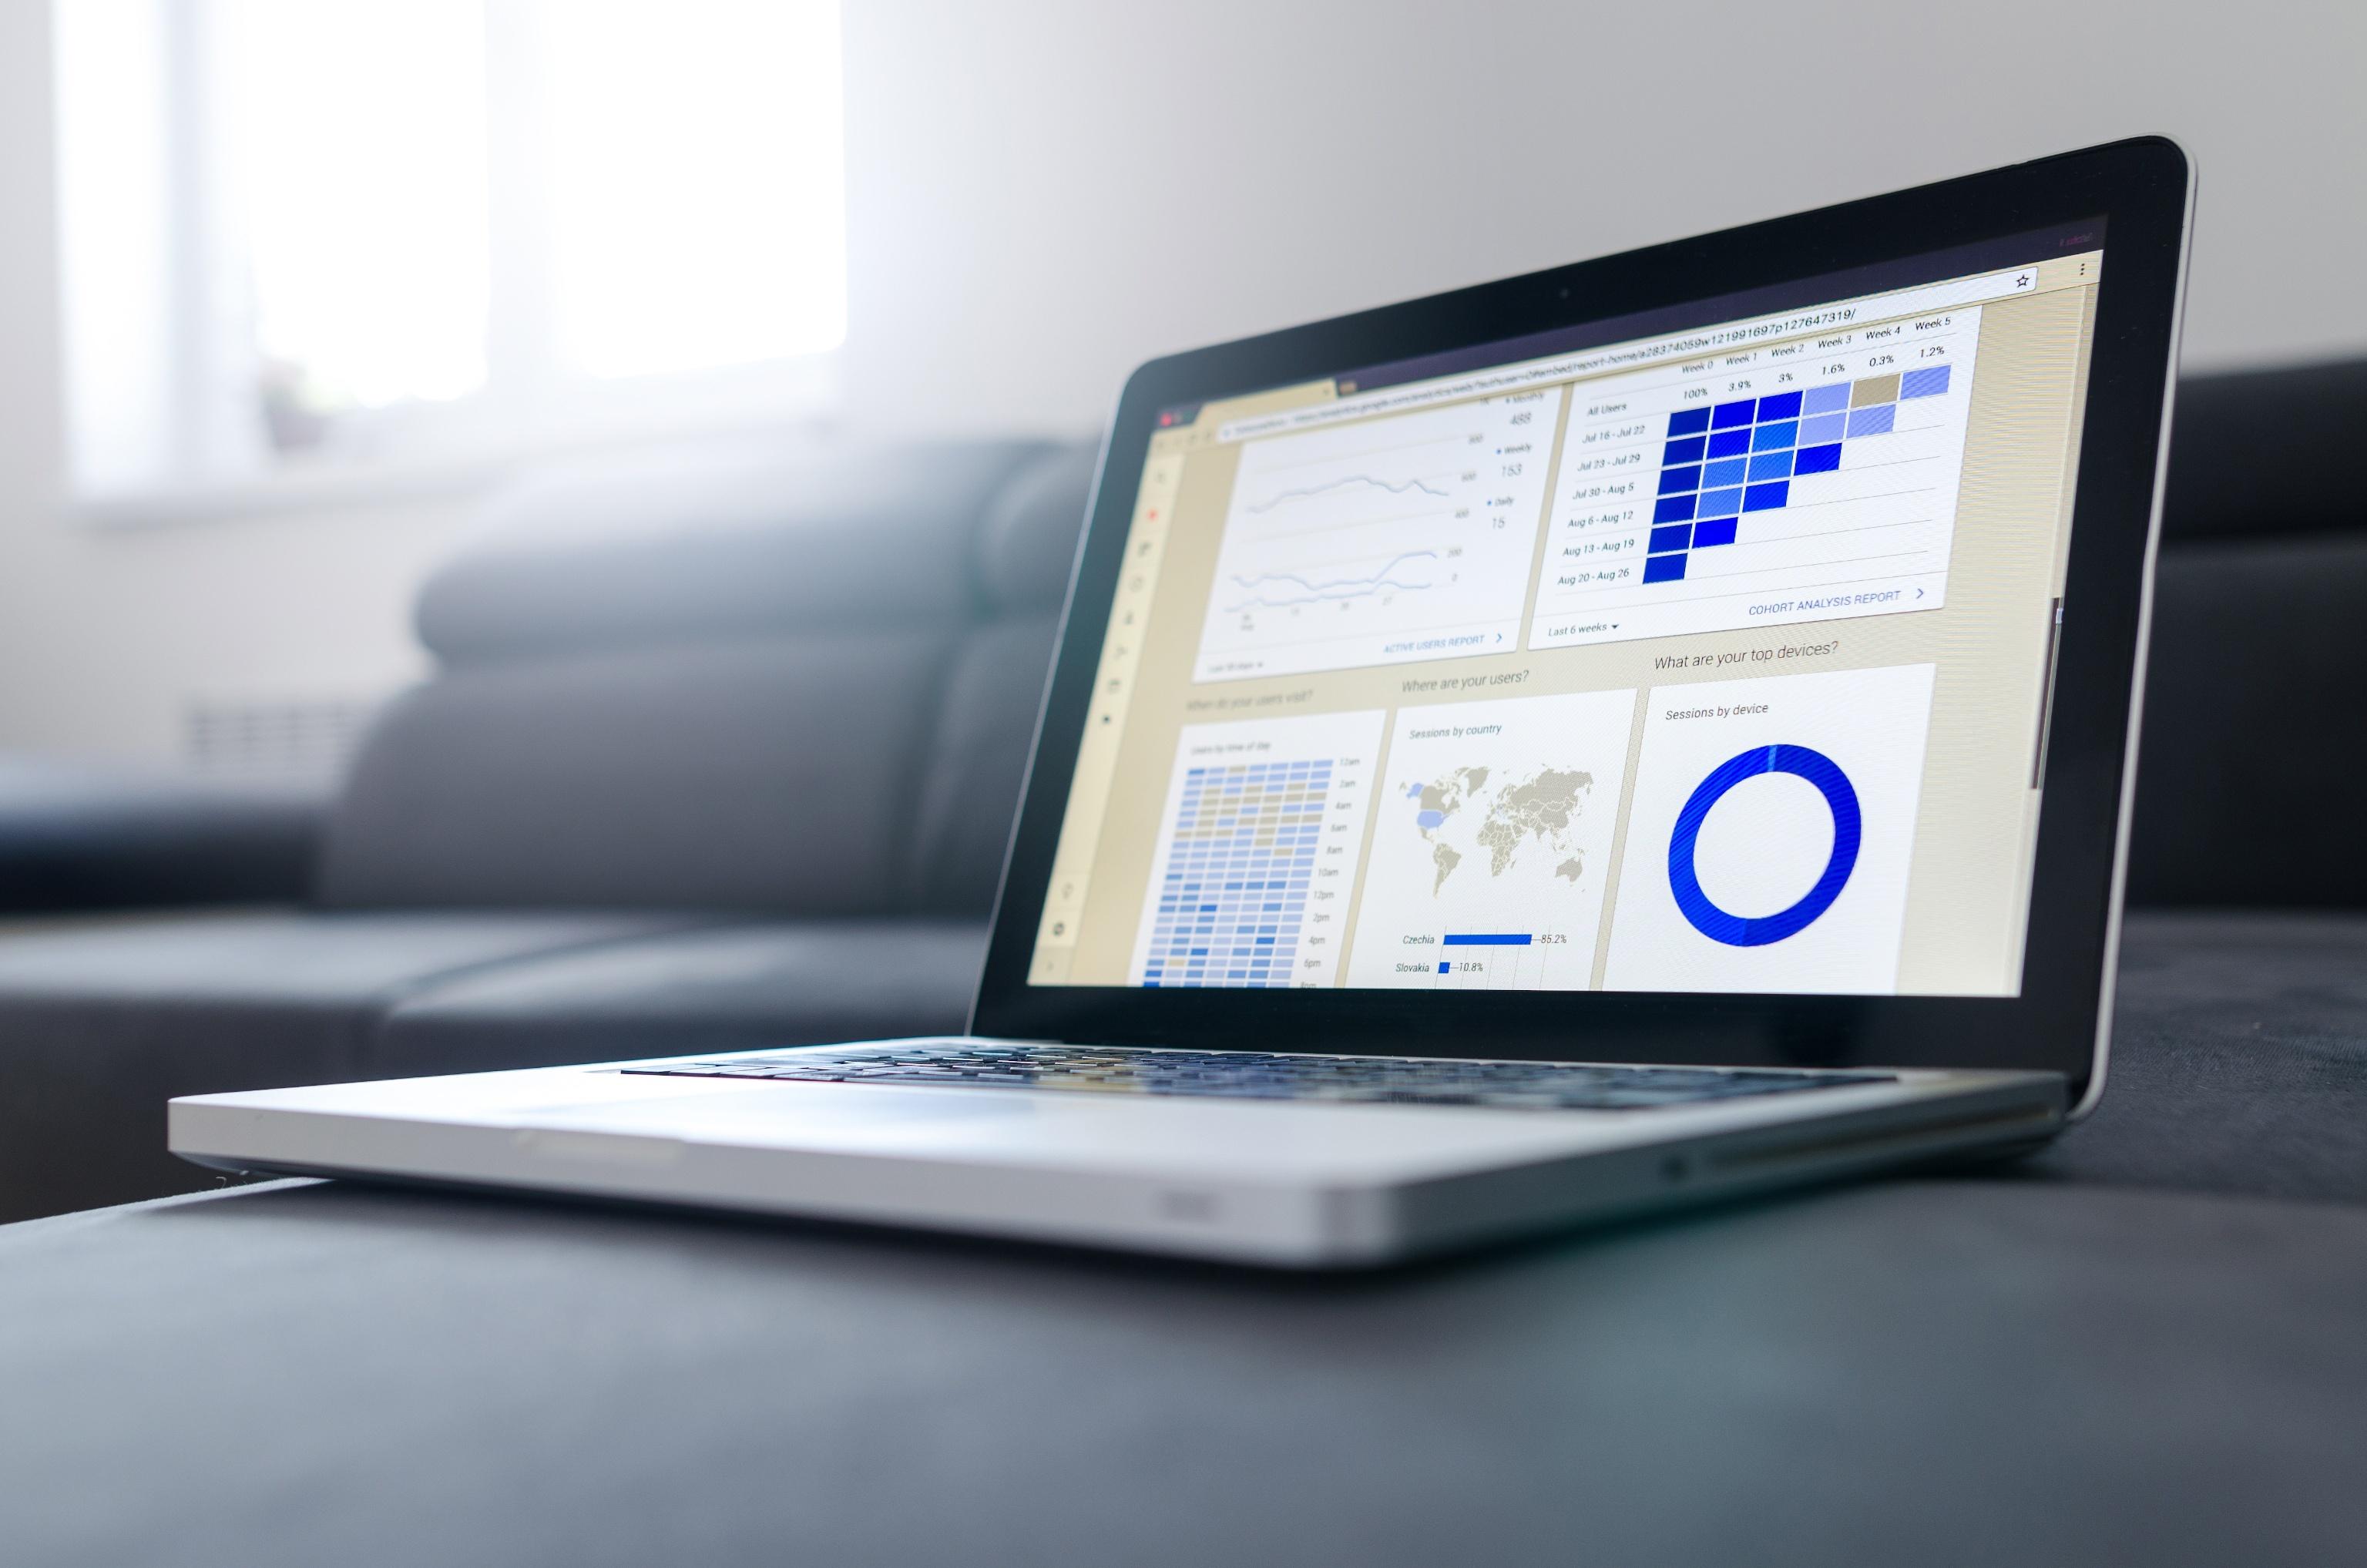 Google Analytics open on a macbook